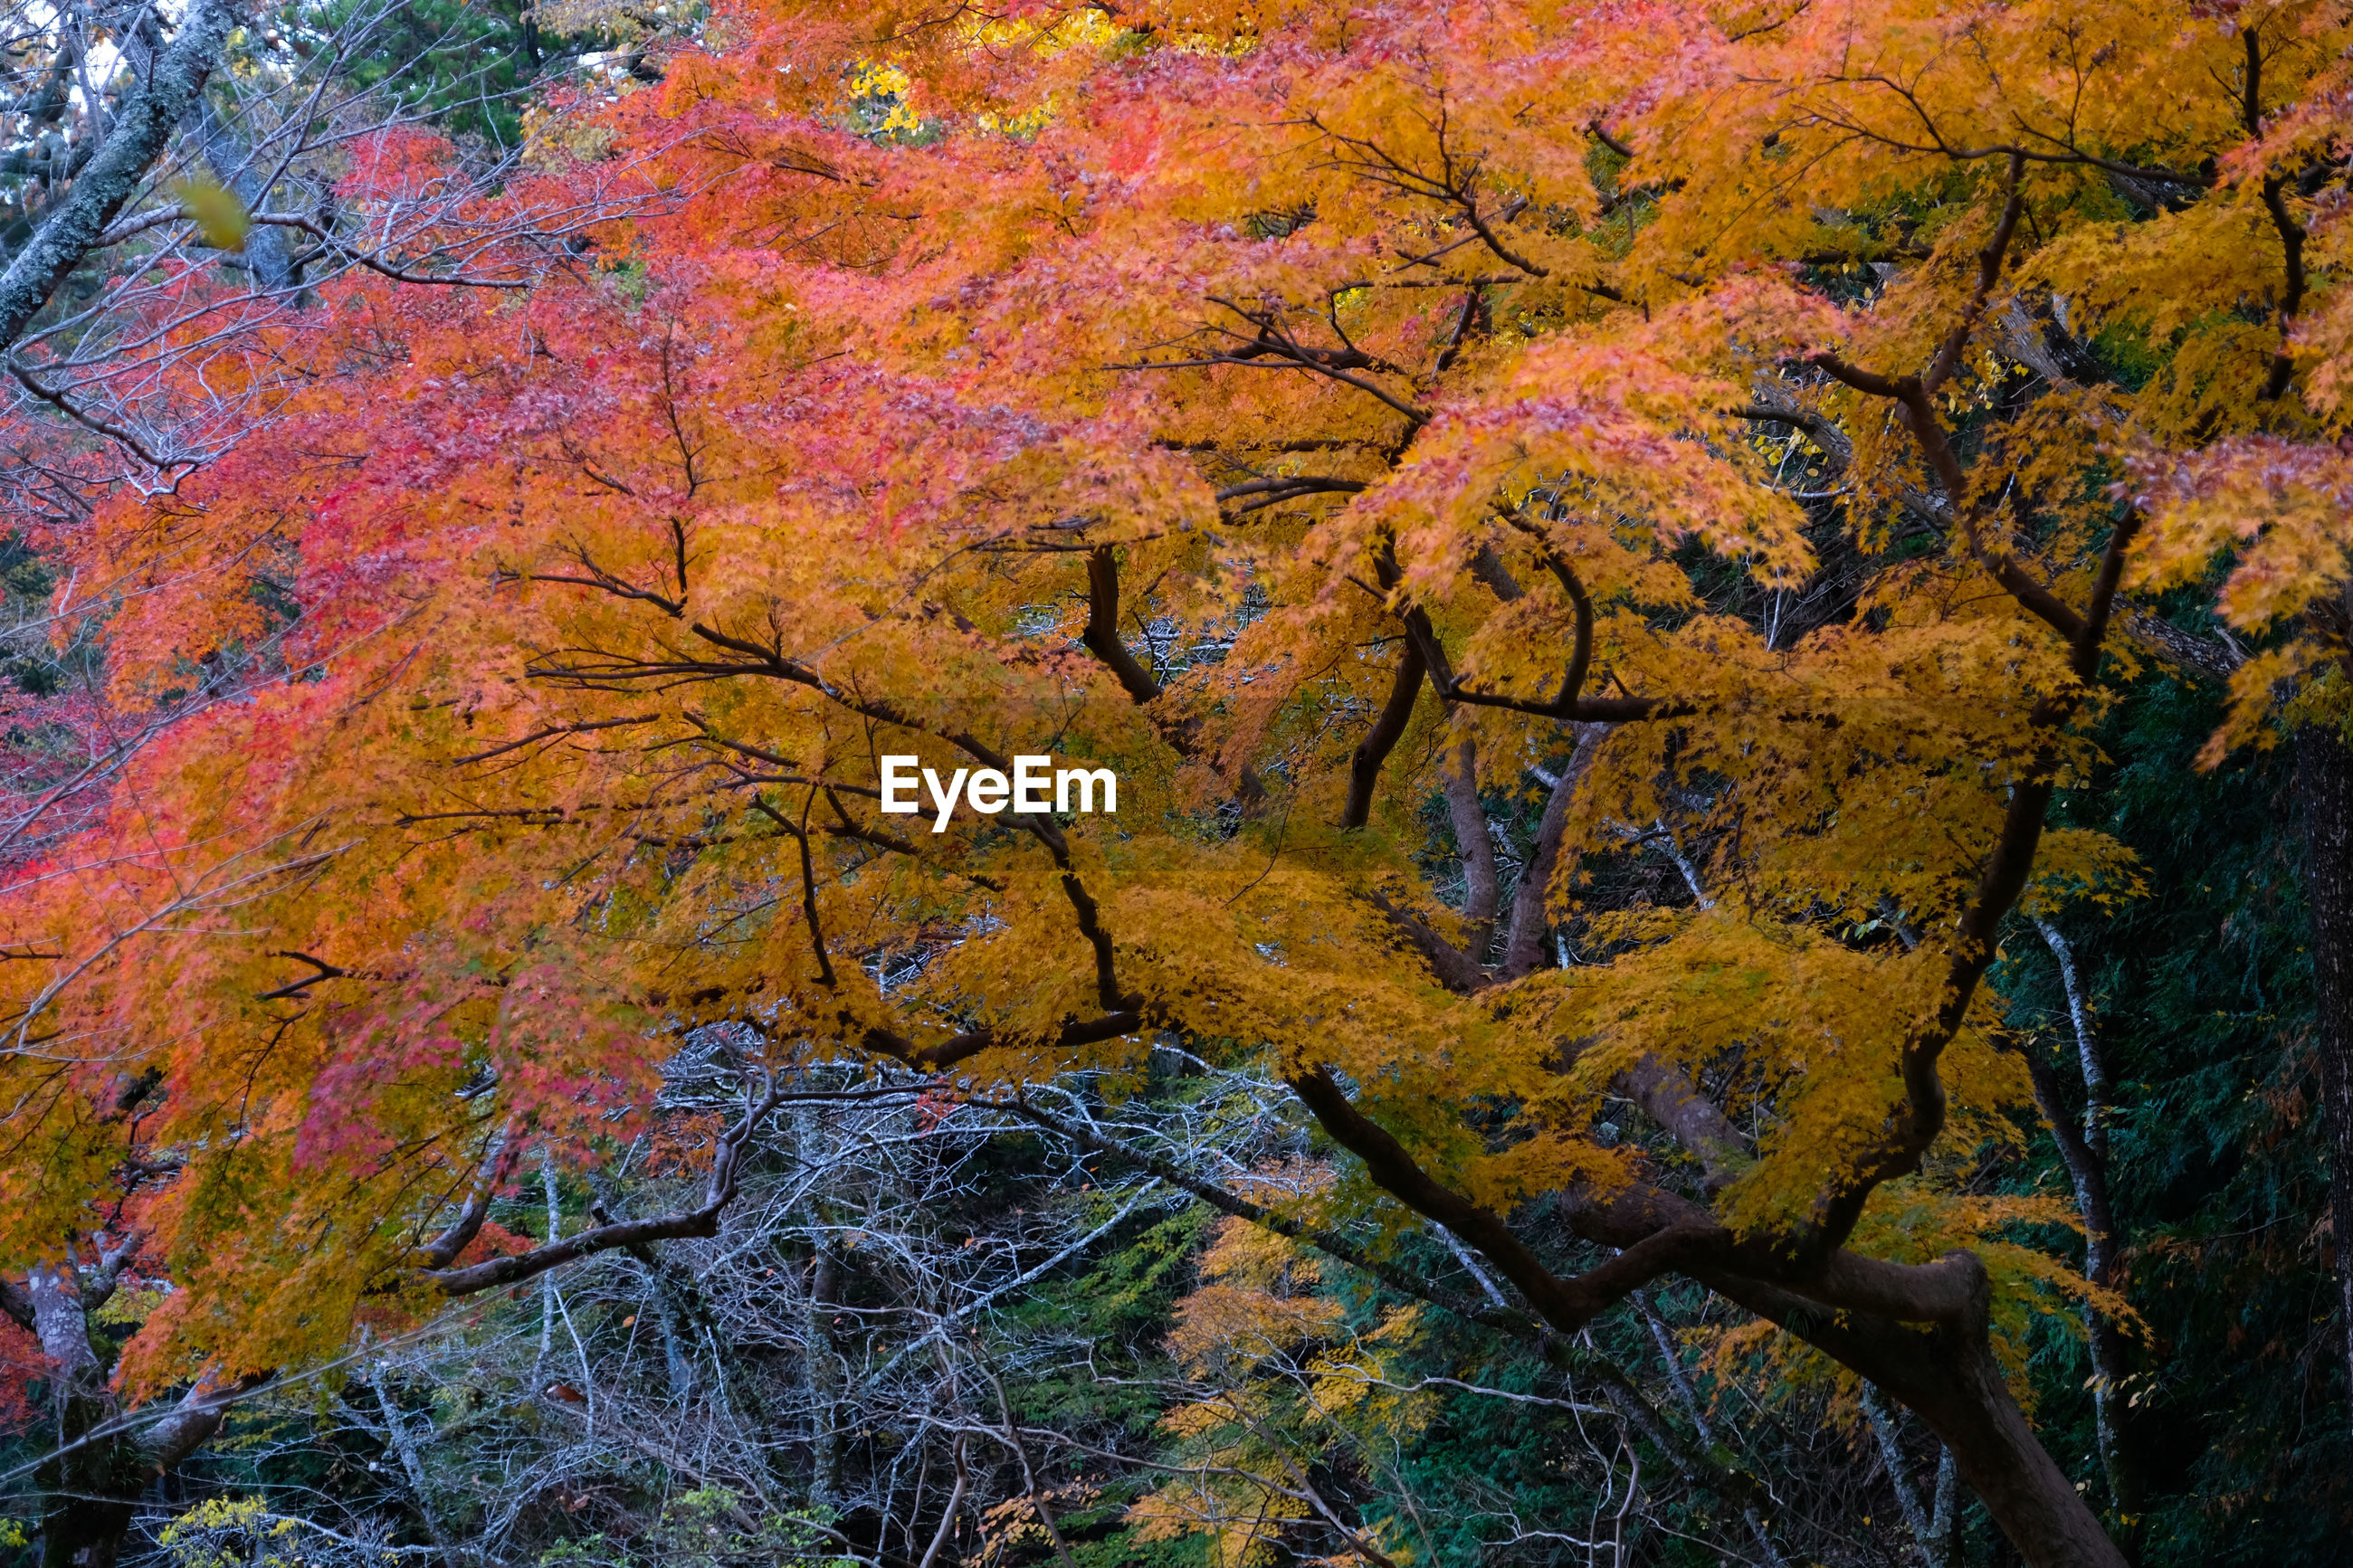 SCENIC VIEW OF AUTUMN TREES